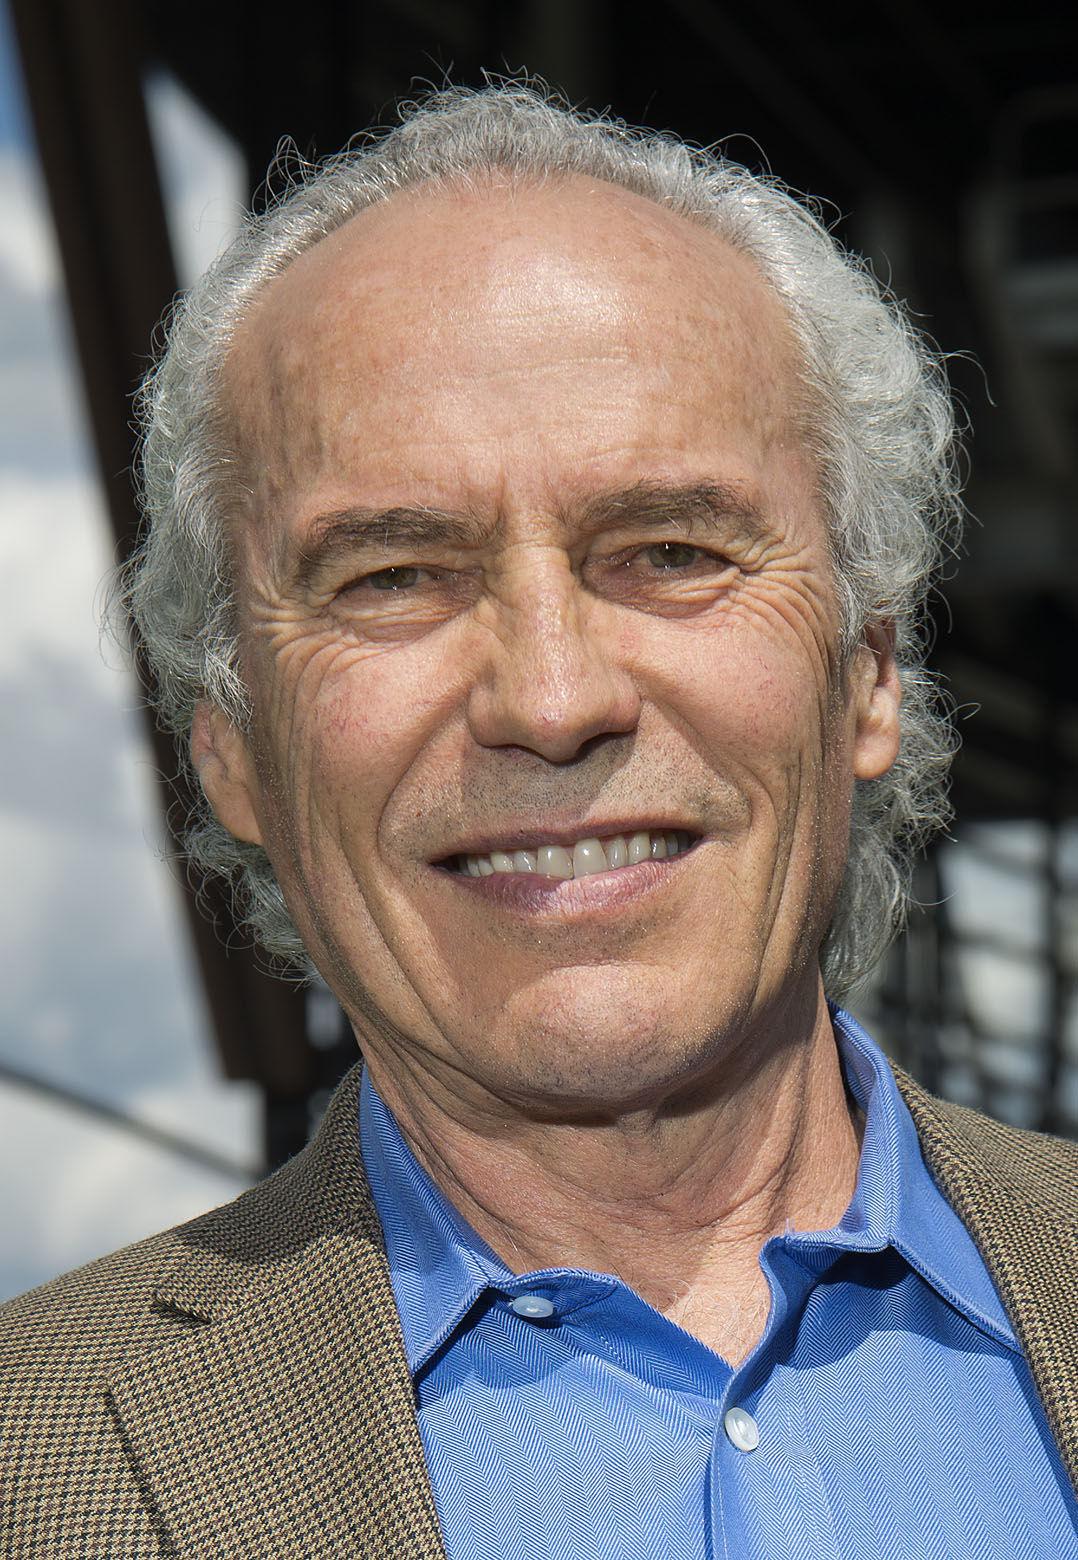 Jerry Blann